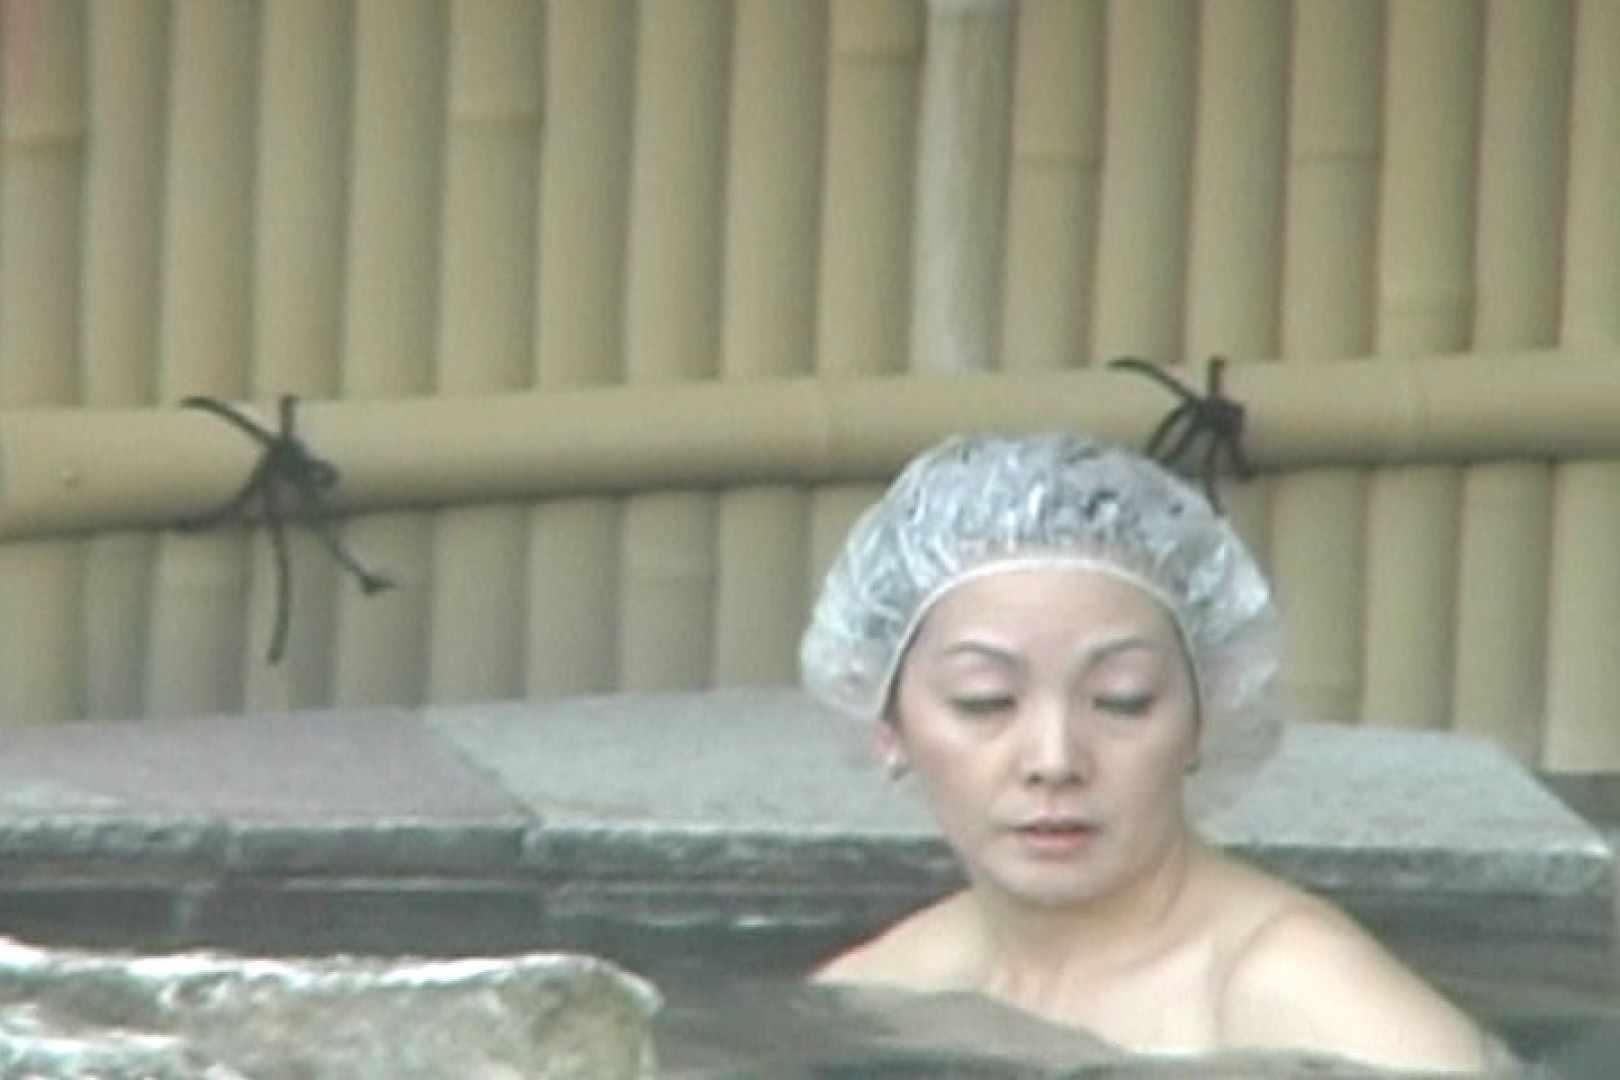 Aquaな露天風呂Vol.592 盗撮師作品  91pic 3